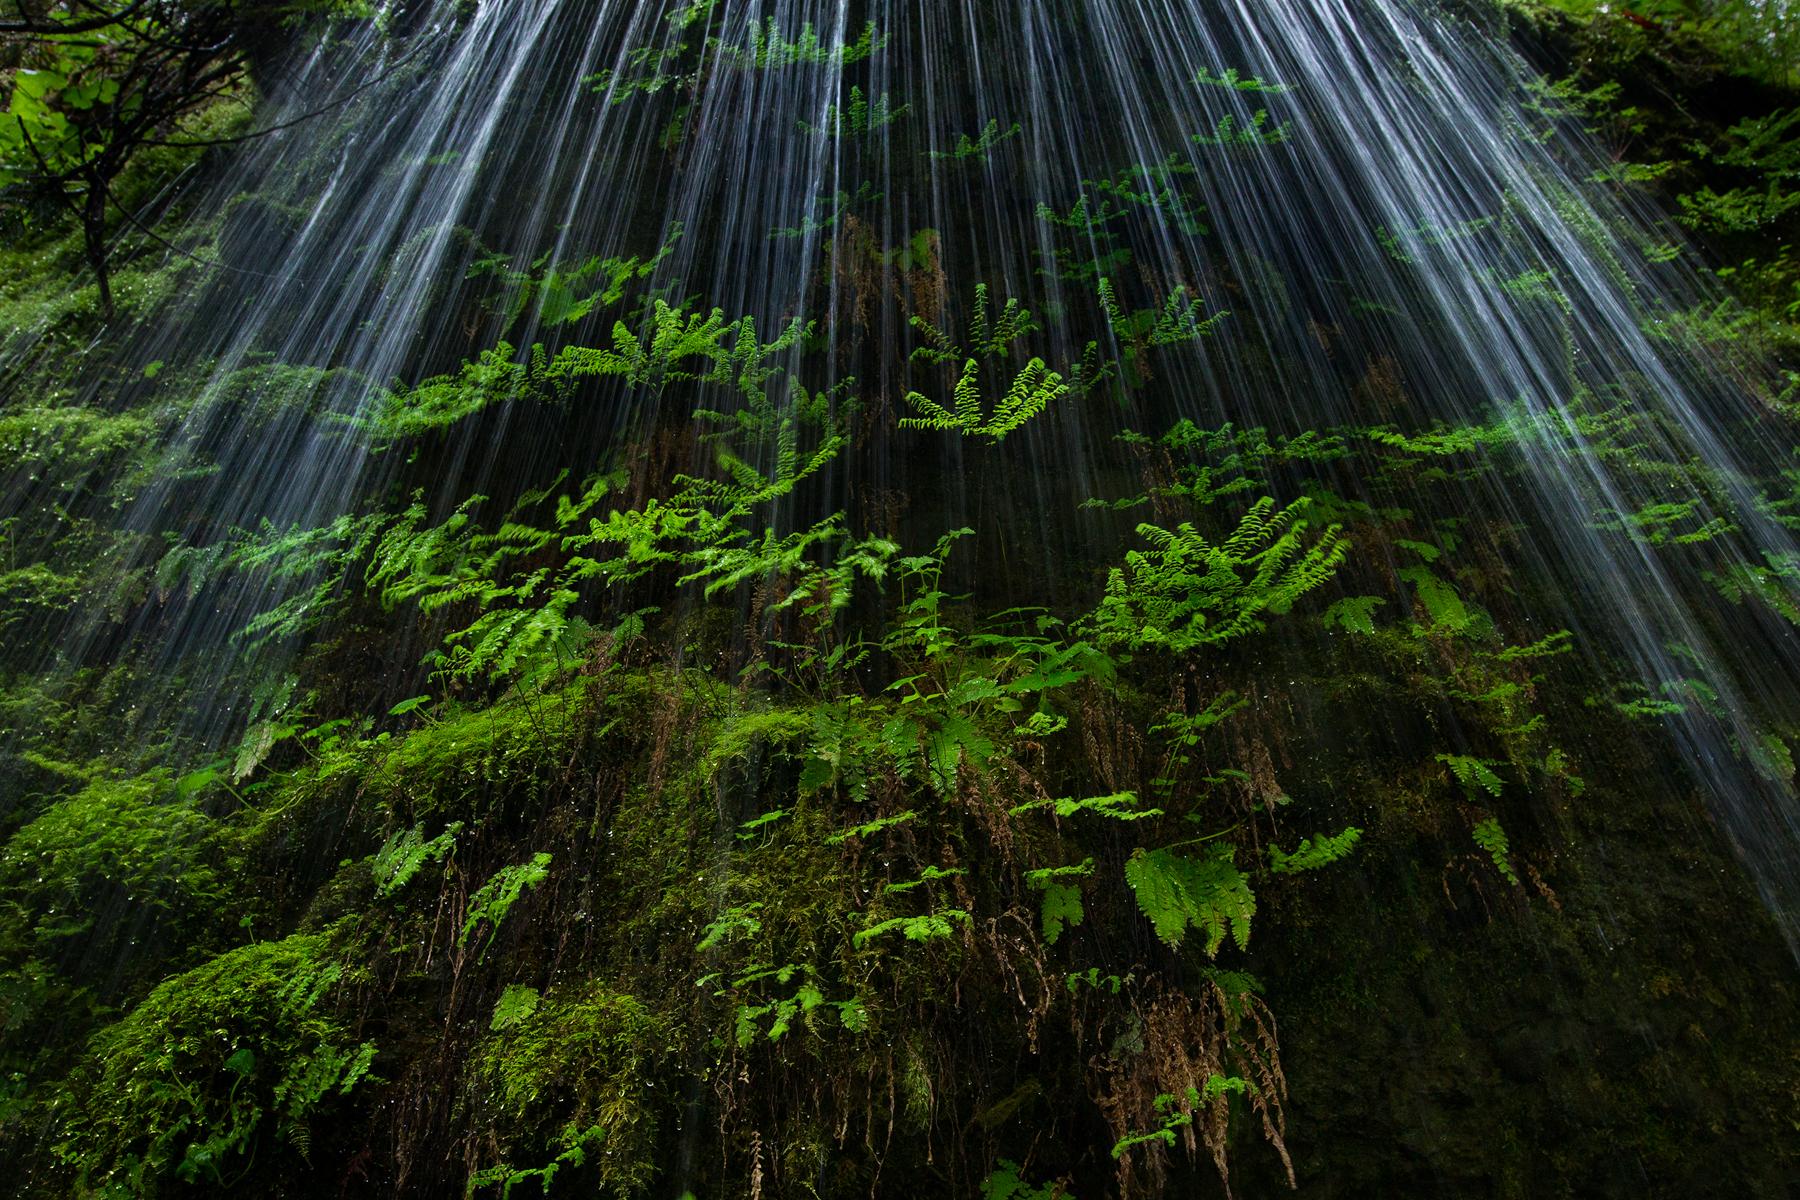 Water falls over Maidenhair Ferns near Eagle Creek in Oregon, USA.  Image ©Connor Stefanison